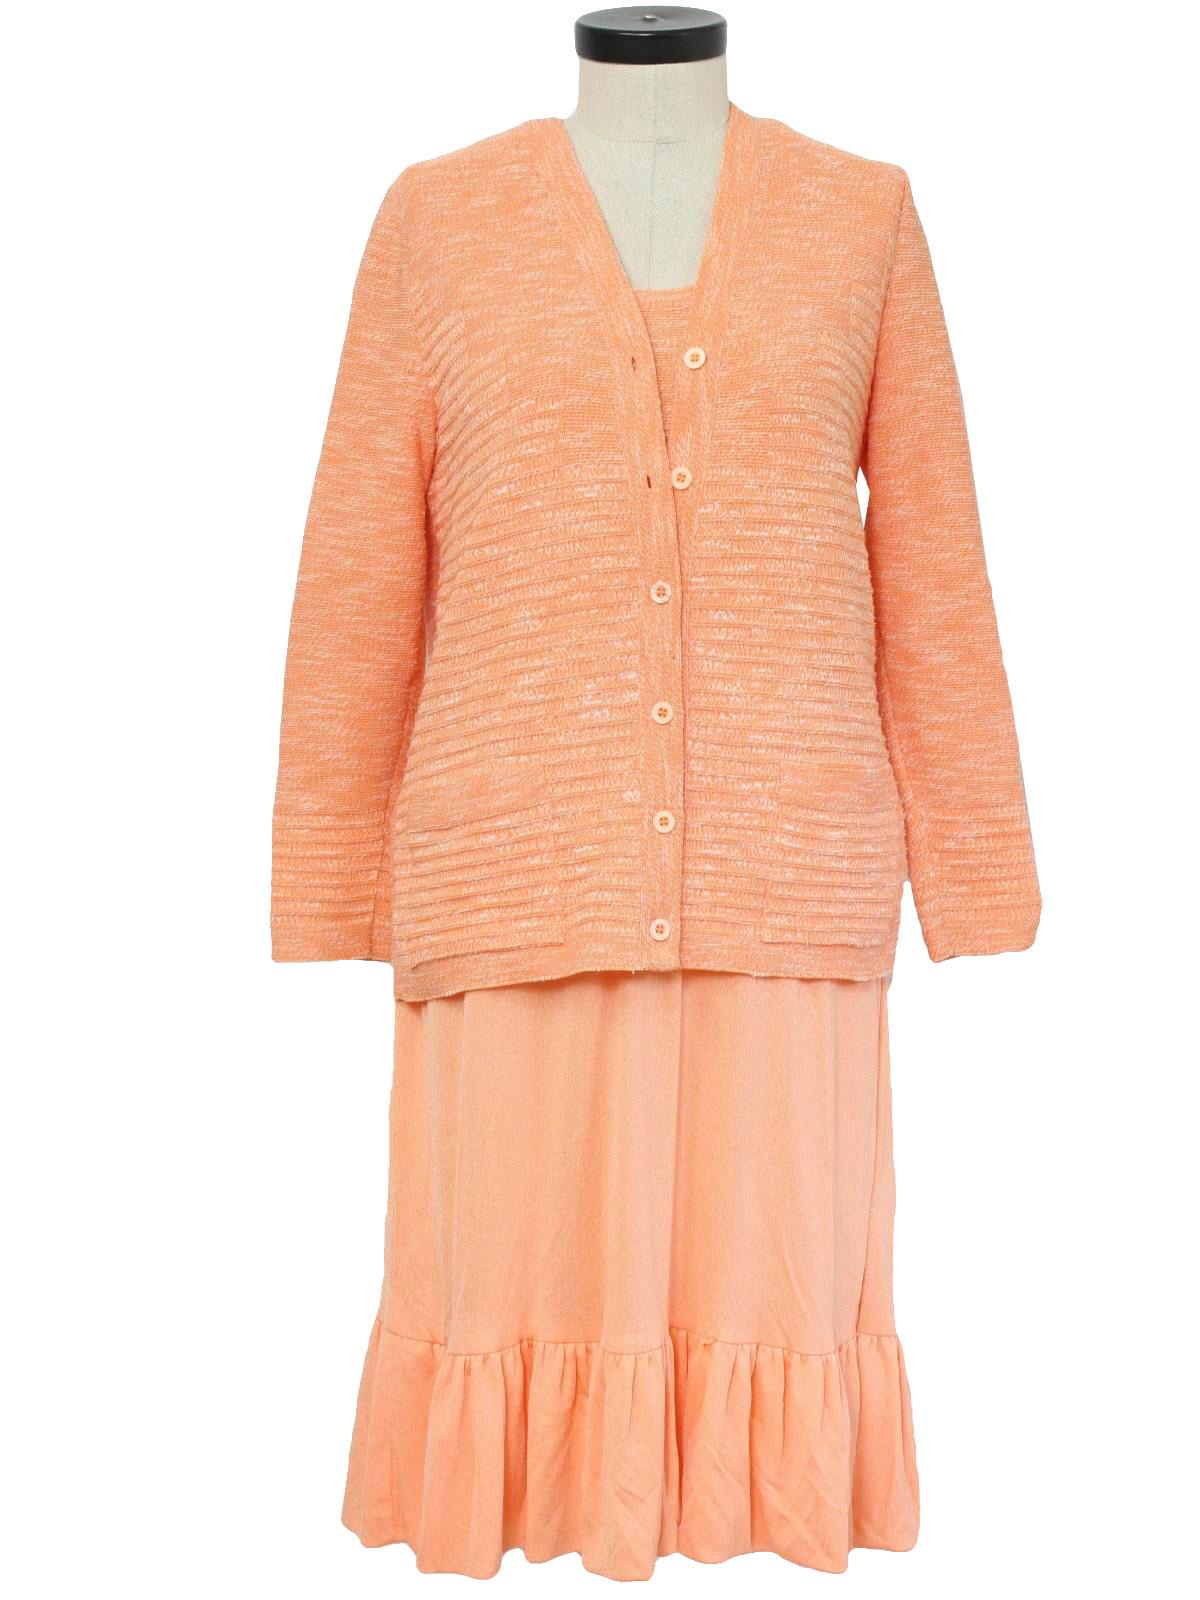 1970 S Retro Suit 70s Jameskenrob Womens Sherbet Orange